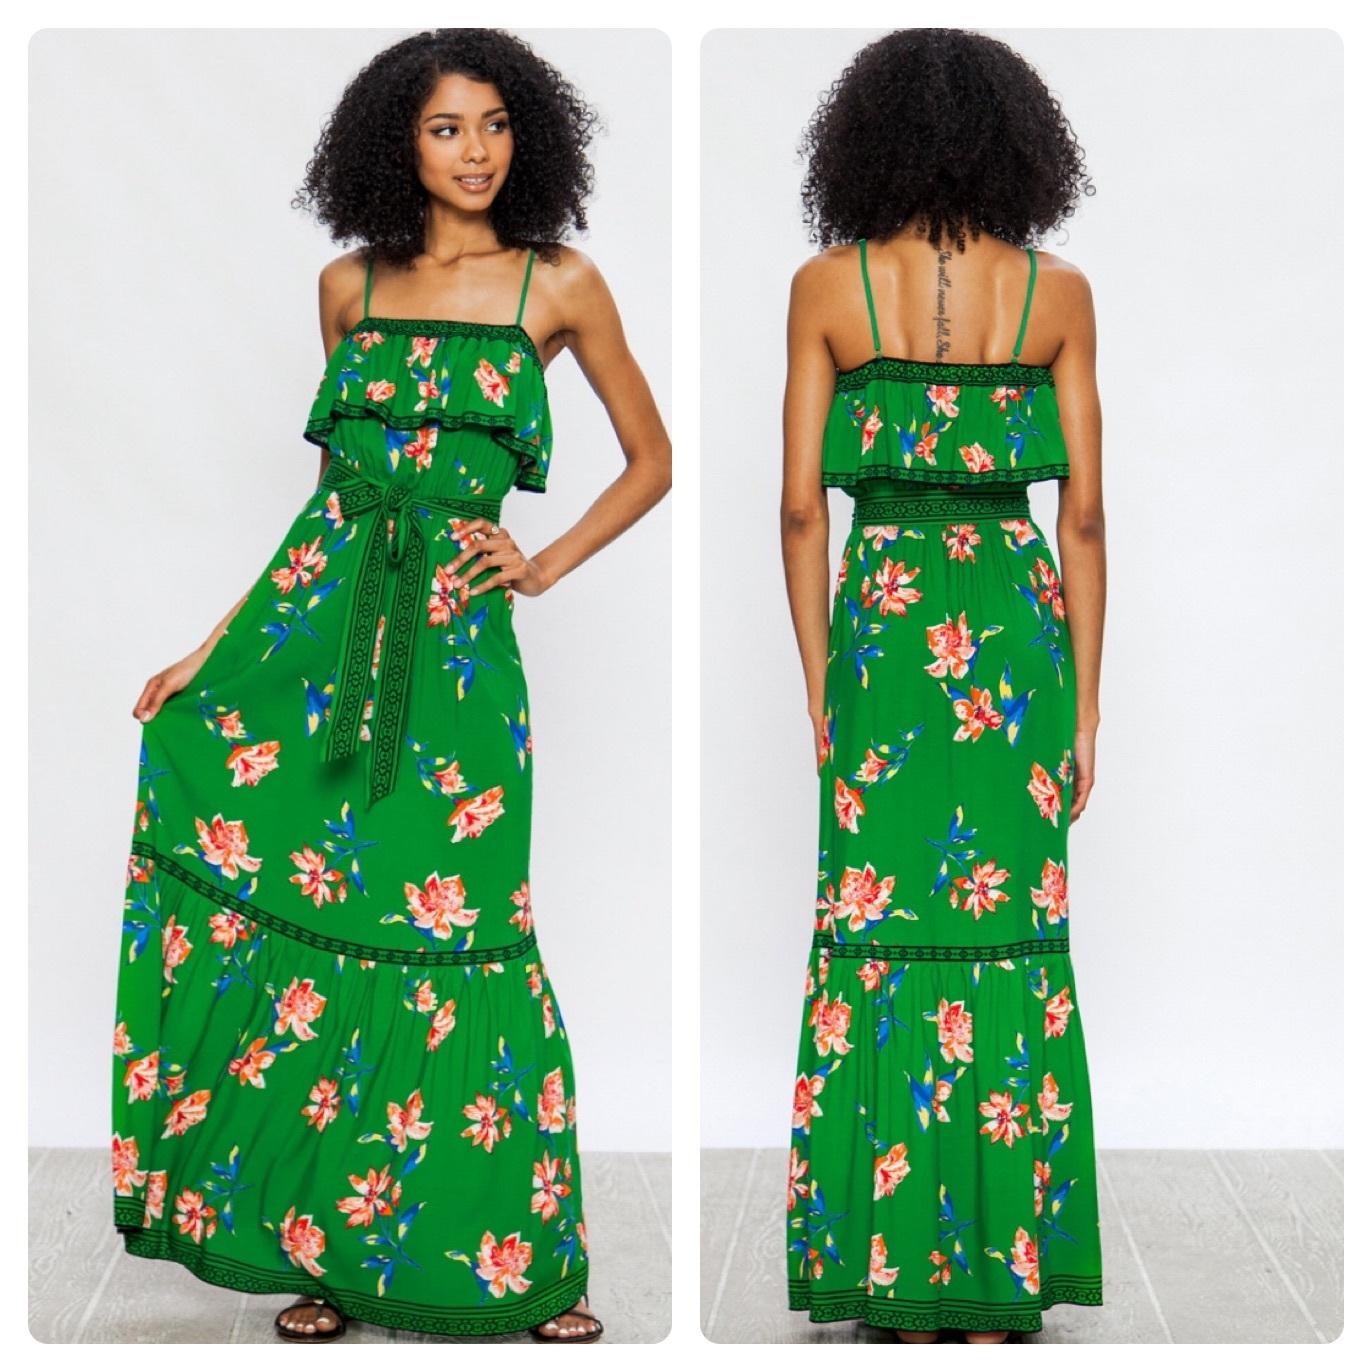 GREEN FLORAL DRESS  $60